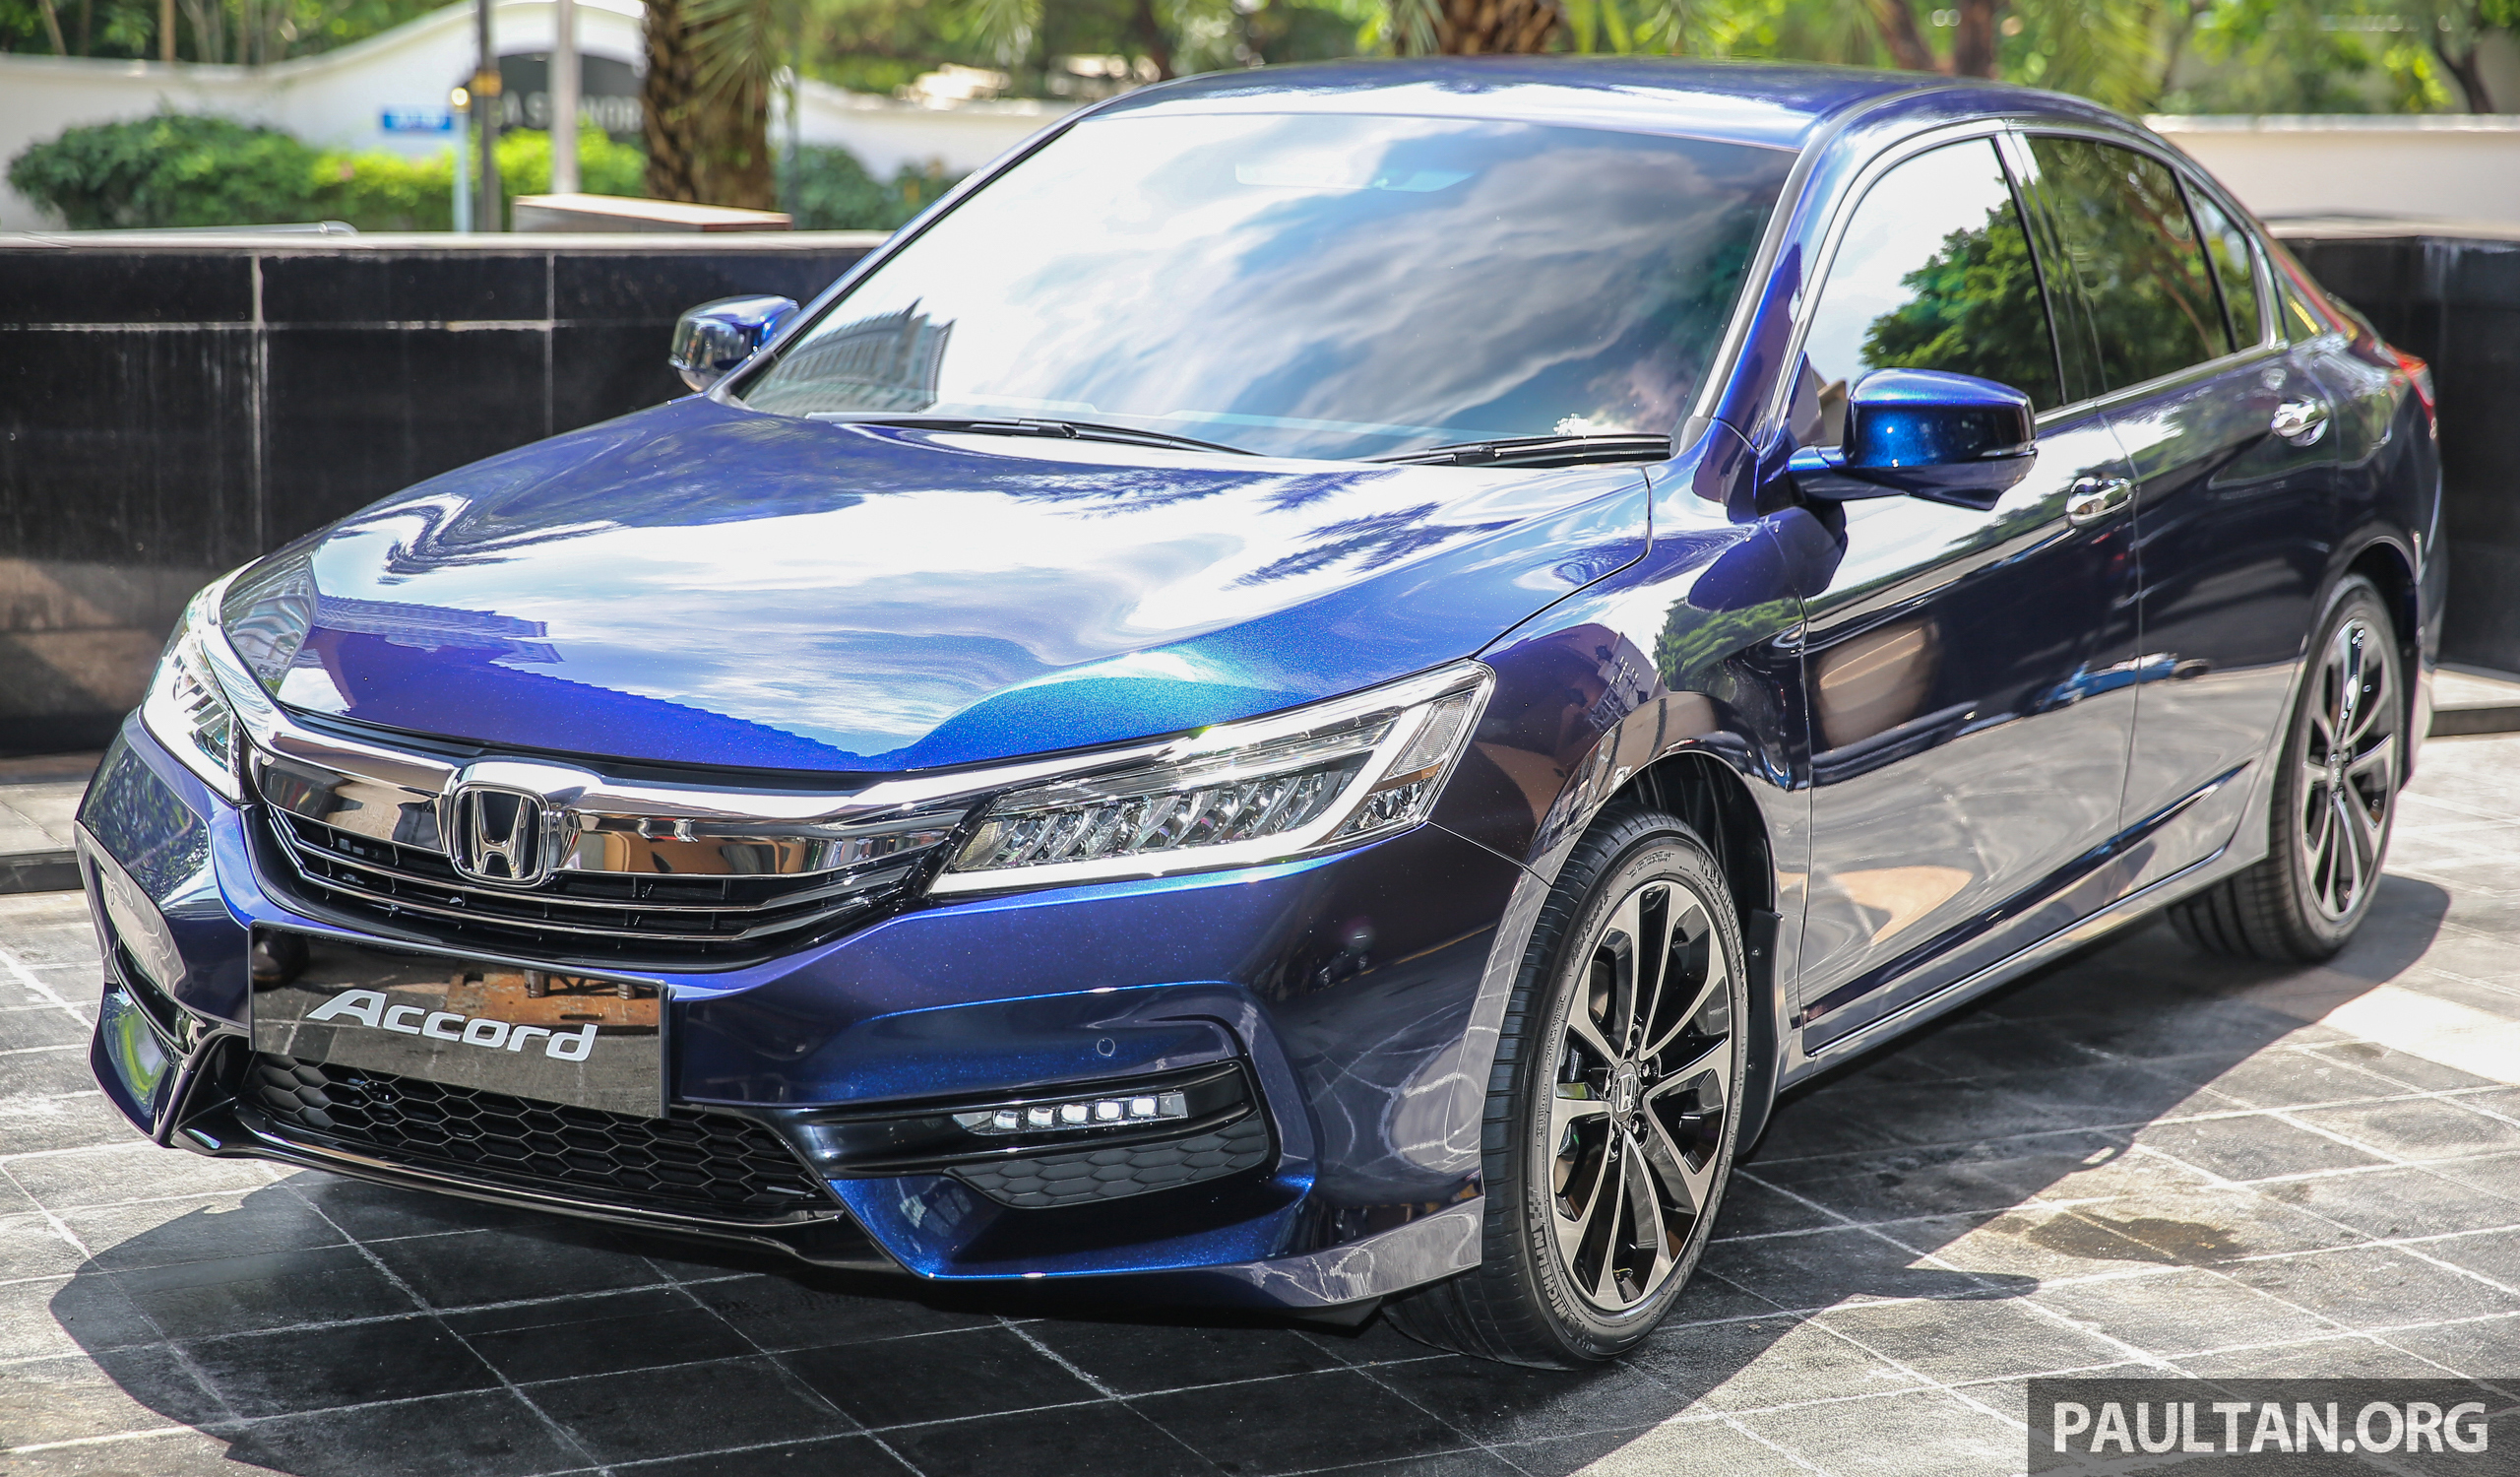 Honda accord 2 4 vti l facelift previewed in malaysia for Honda accord 2016 black